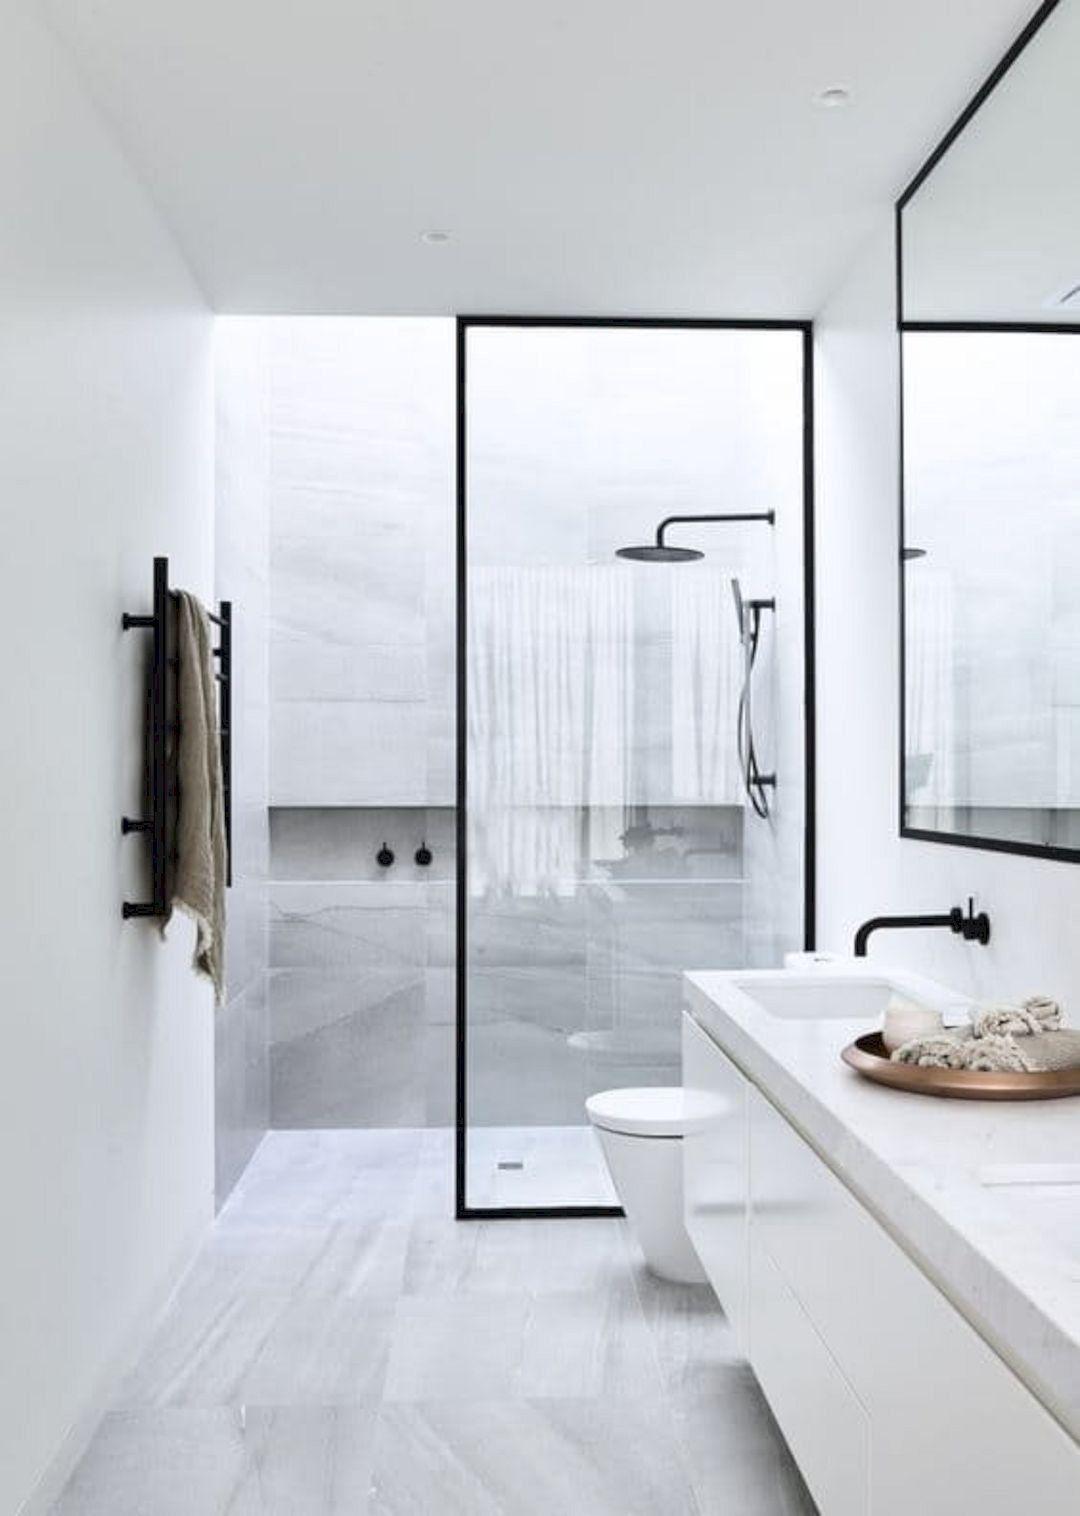 Best Small Bathroom Remodel: 111 Design Ideas | Small bathroom ...